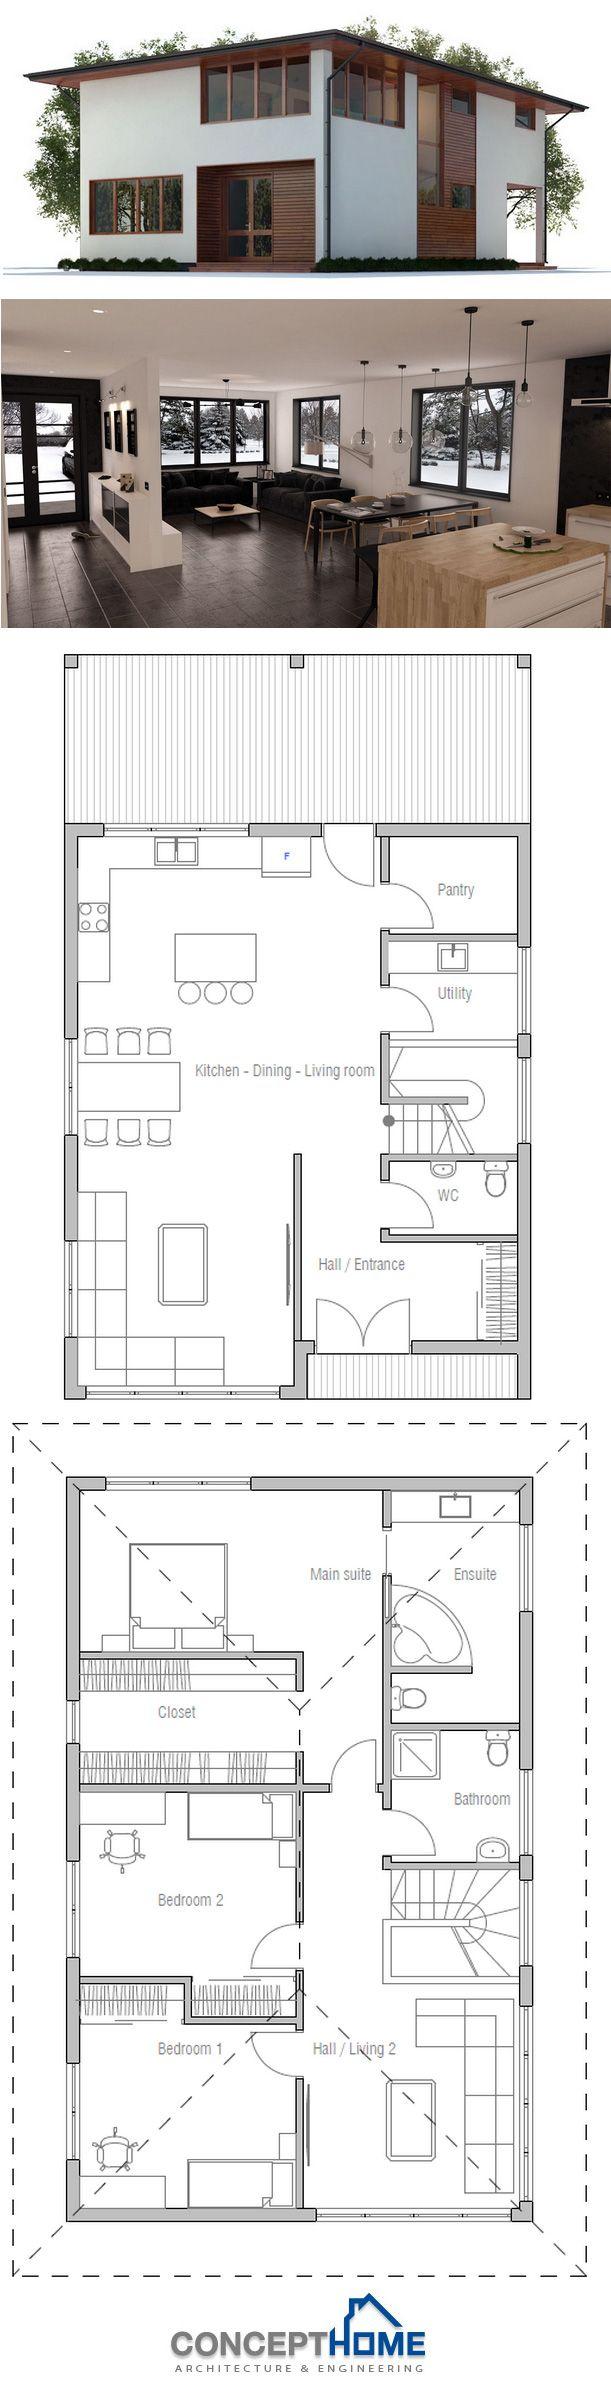 House Design 2015 Love it Needs